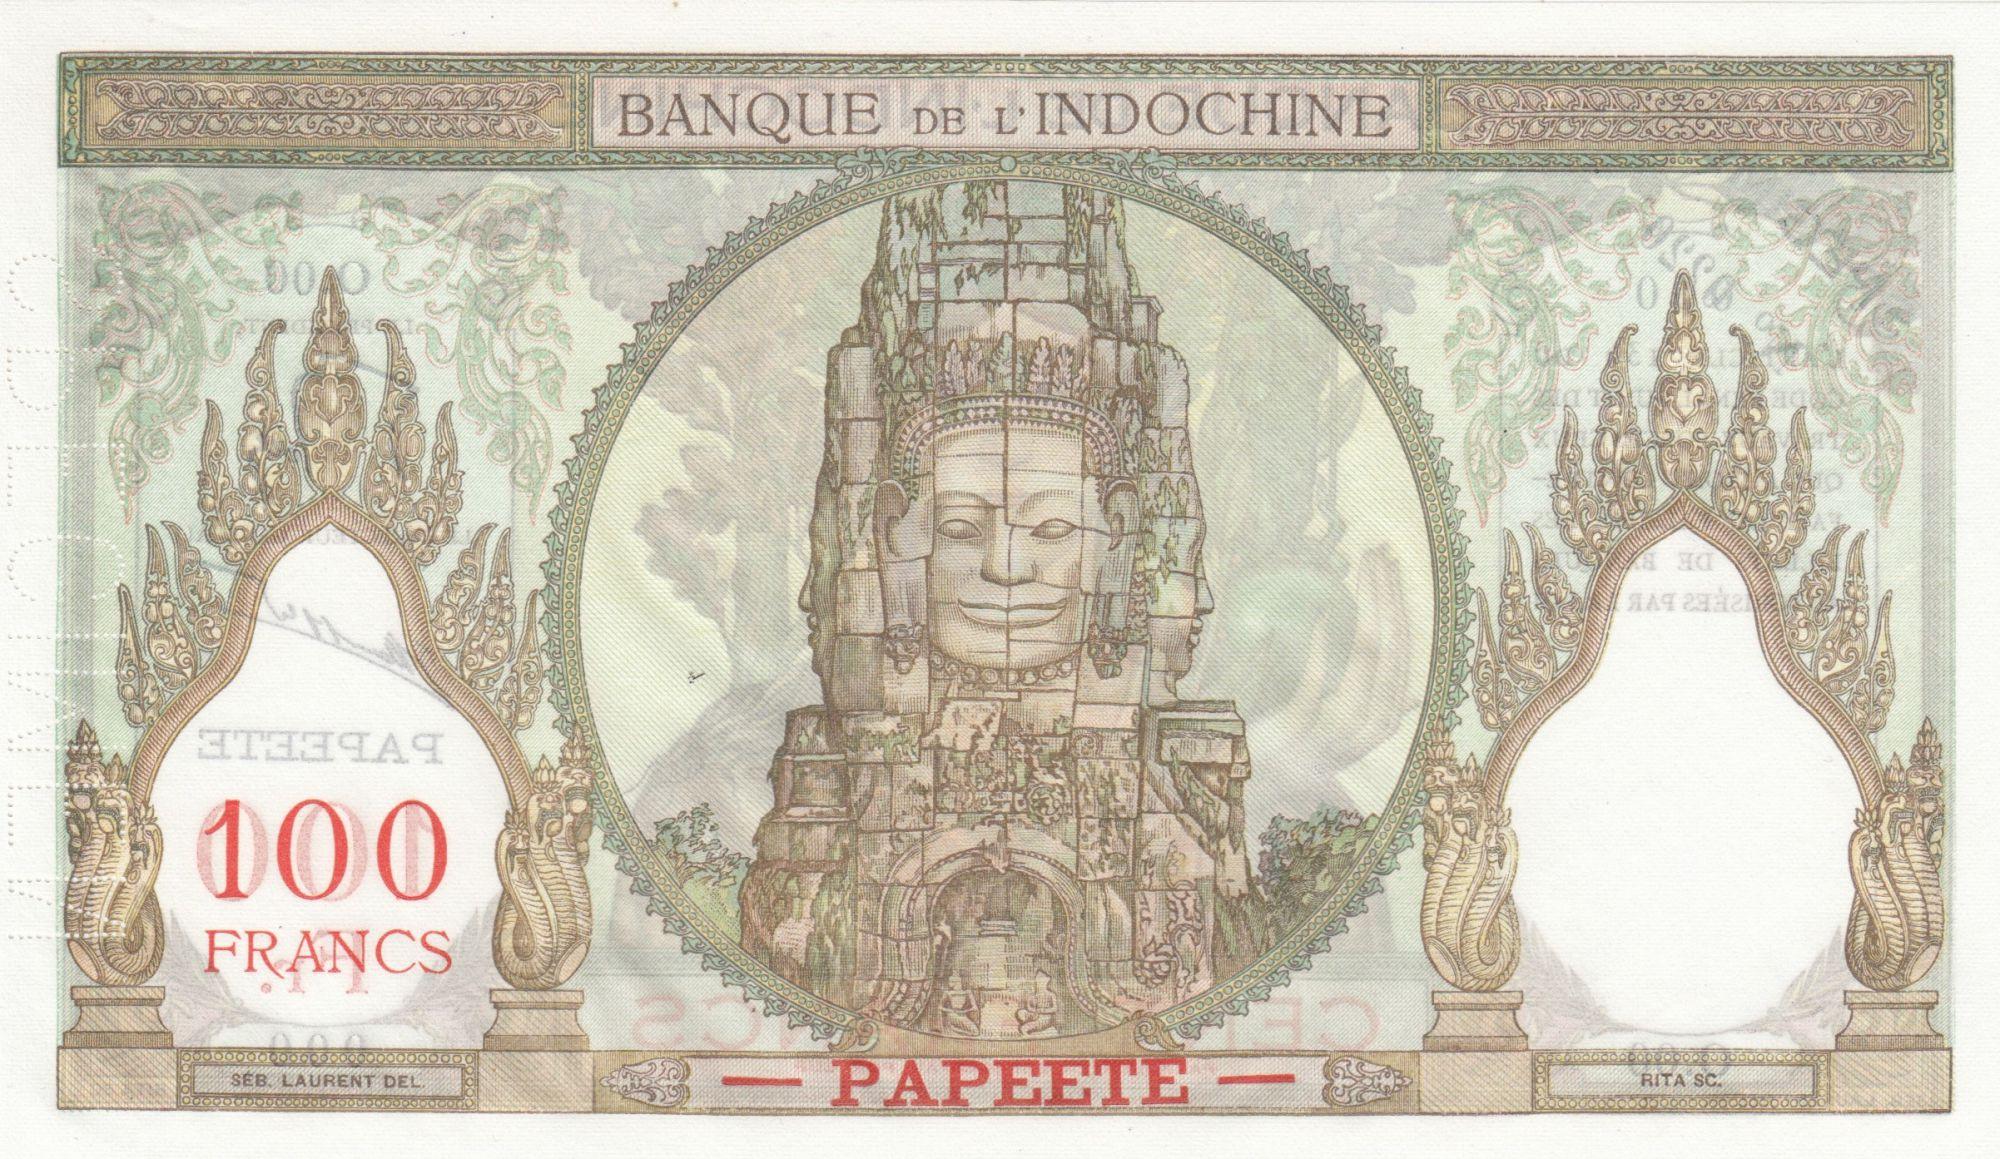 Tahiti 100 Francs Woman - Statue of Angkor - 1961 to 1965 - Specimen - XF